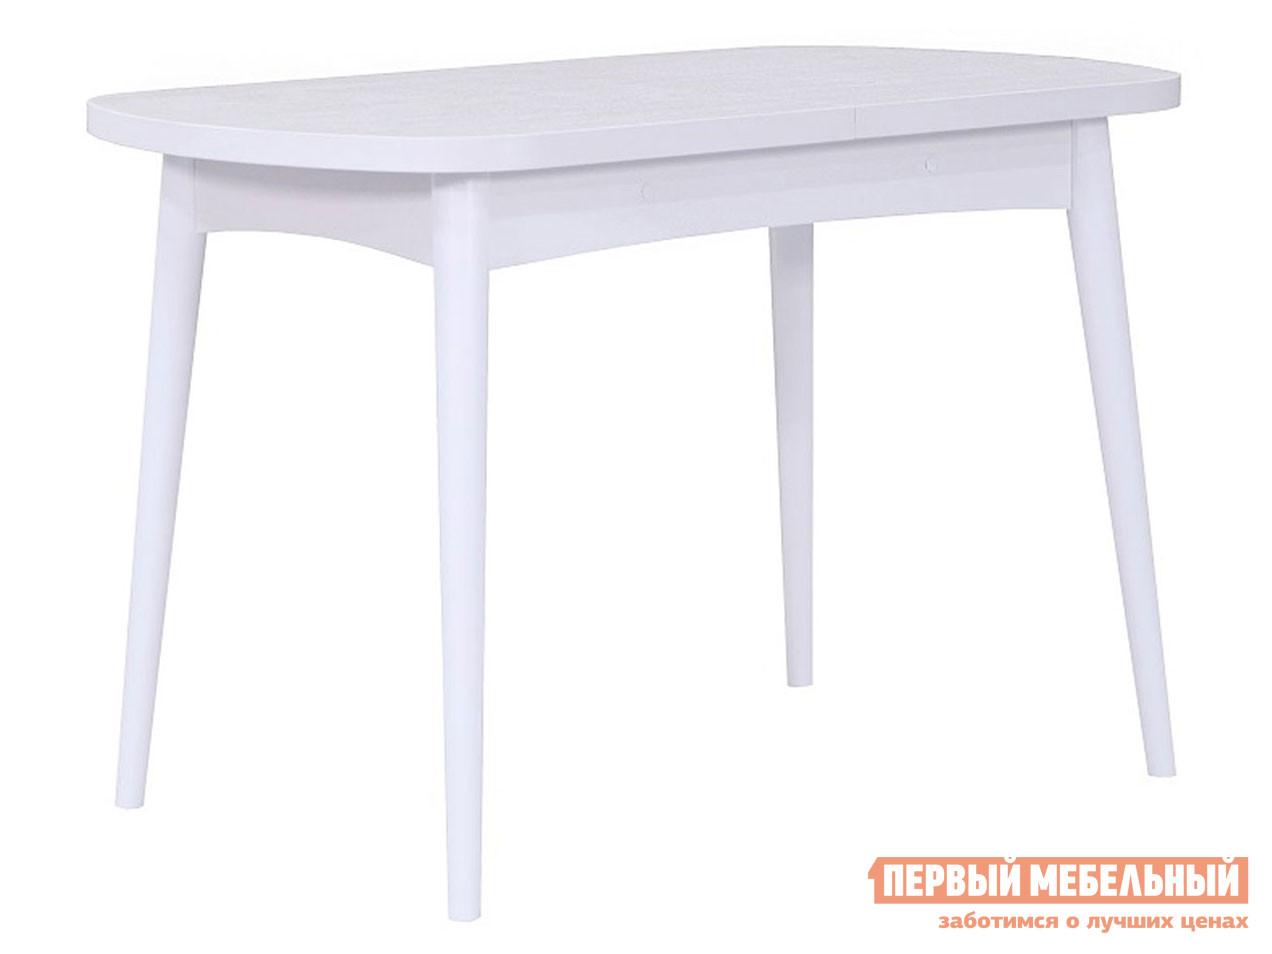 Кухонный стол Mebwill Стол раскладной